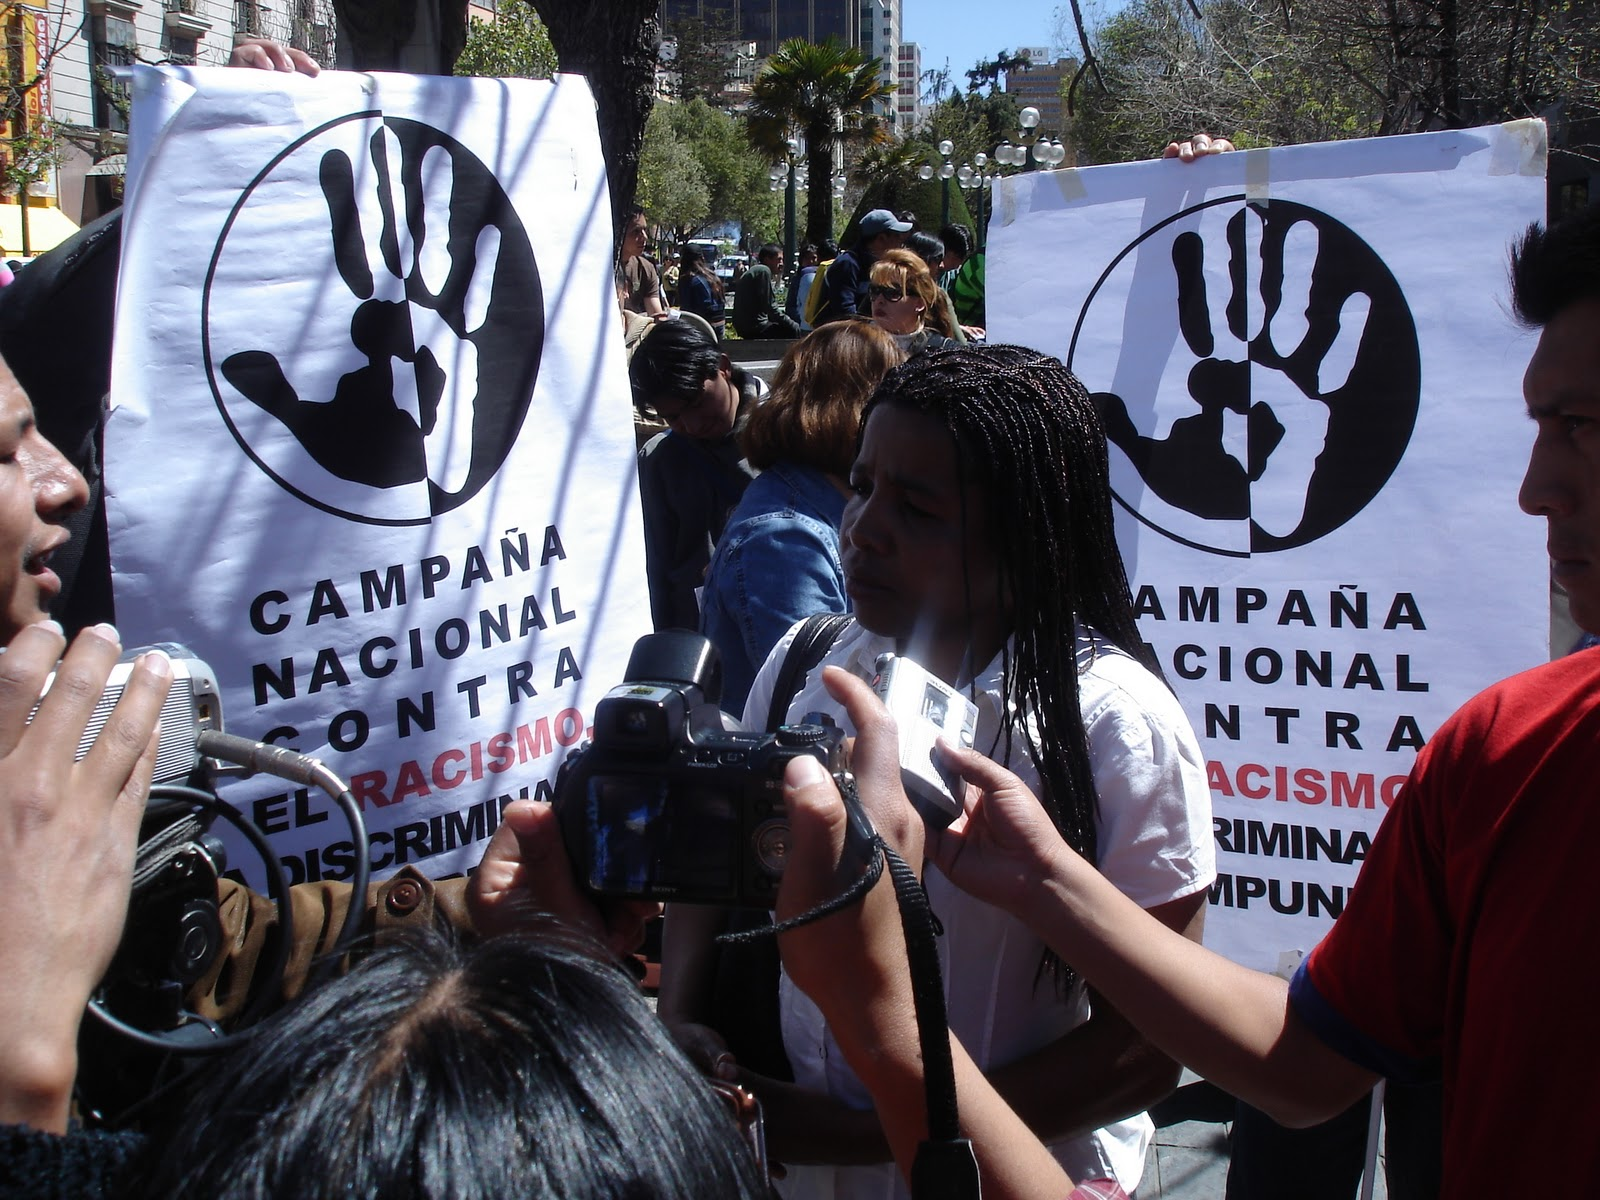 Racismo en Bolivia